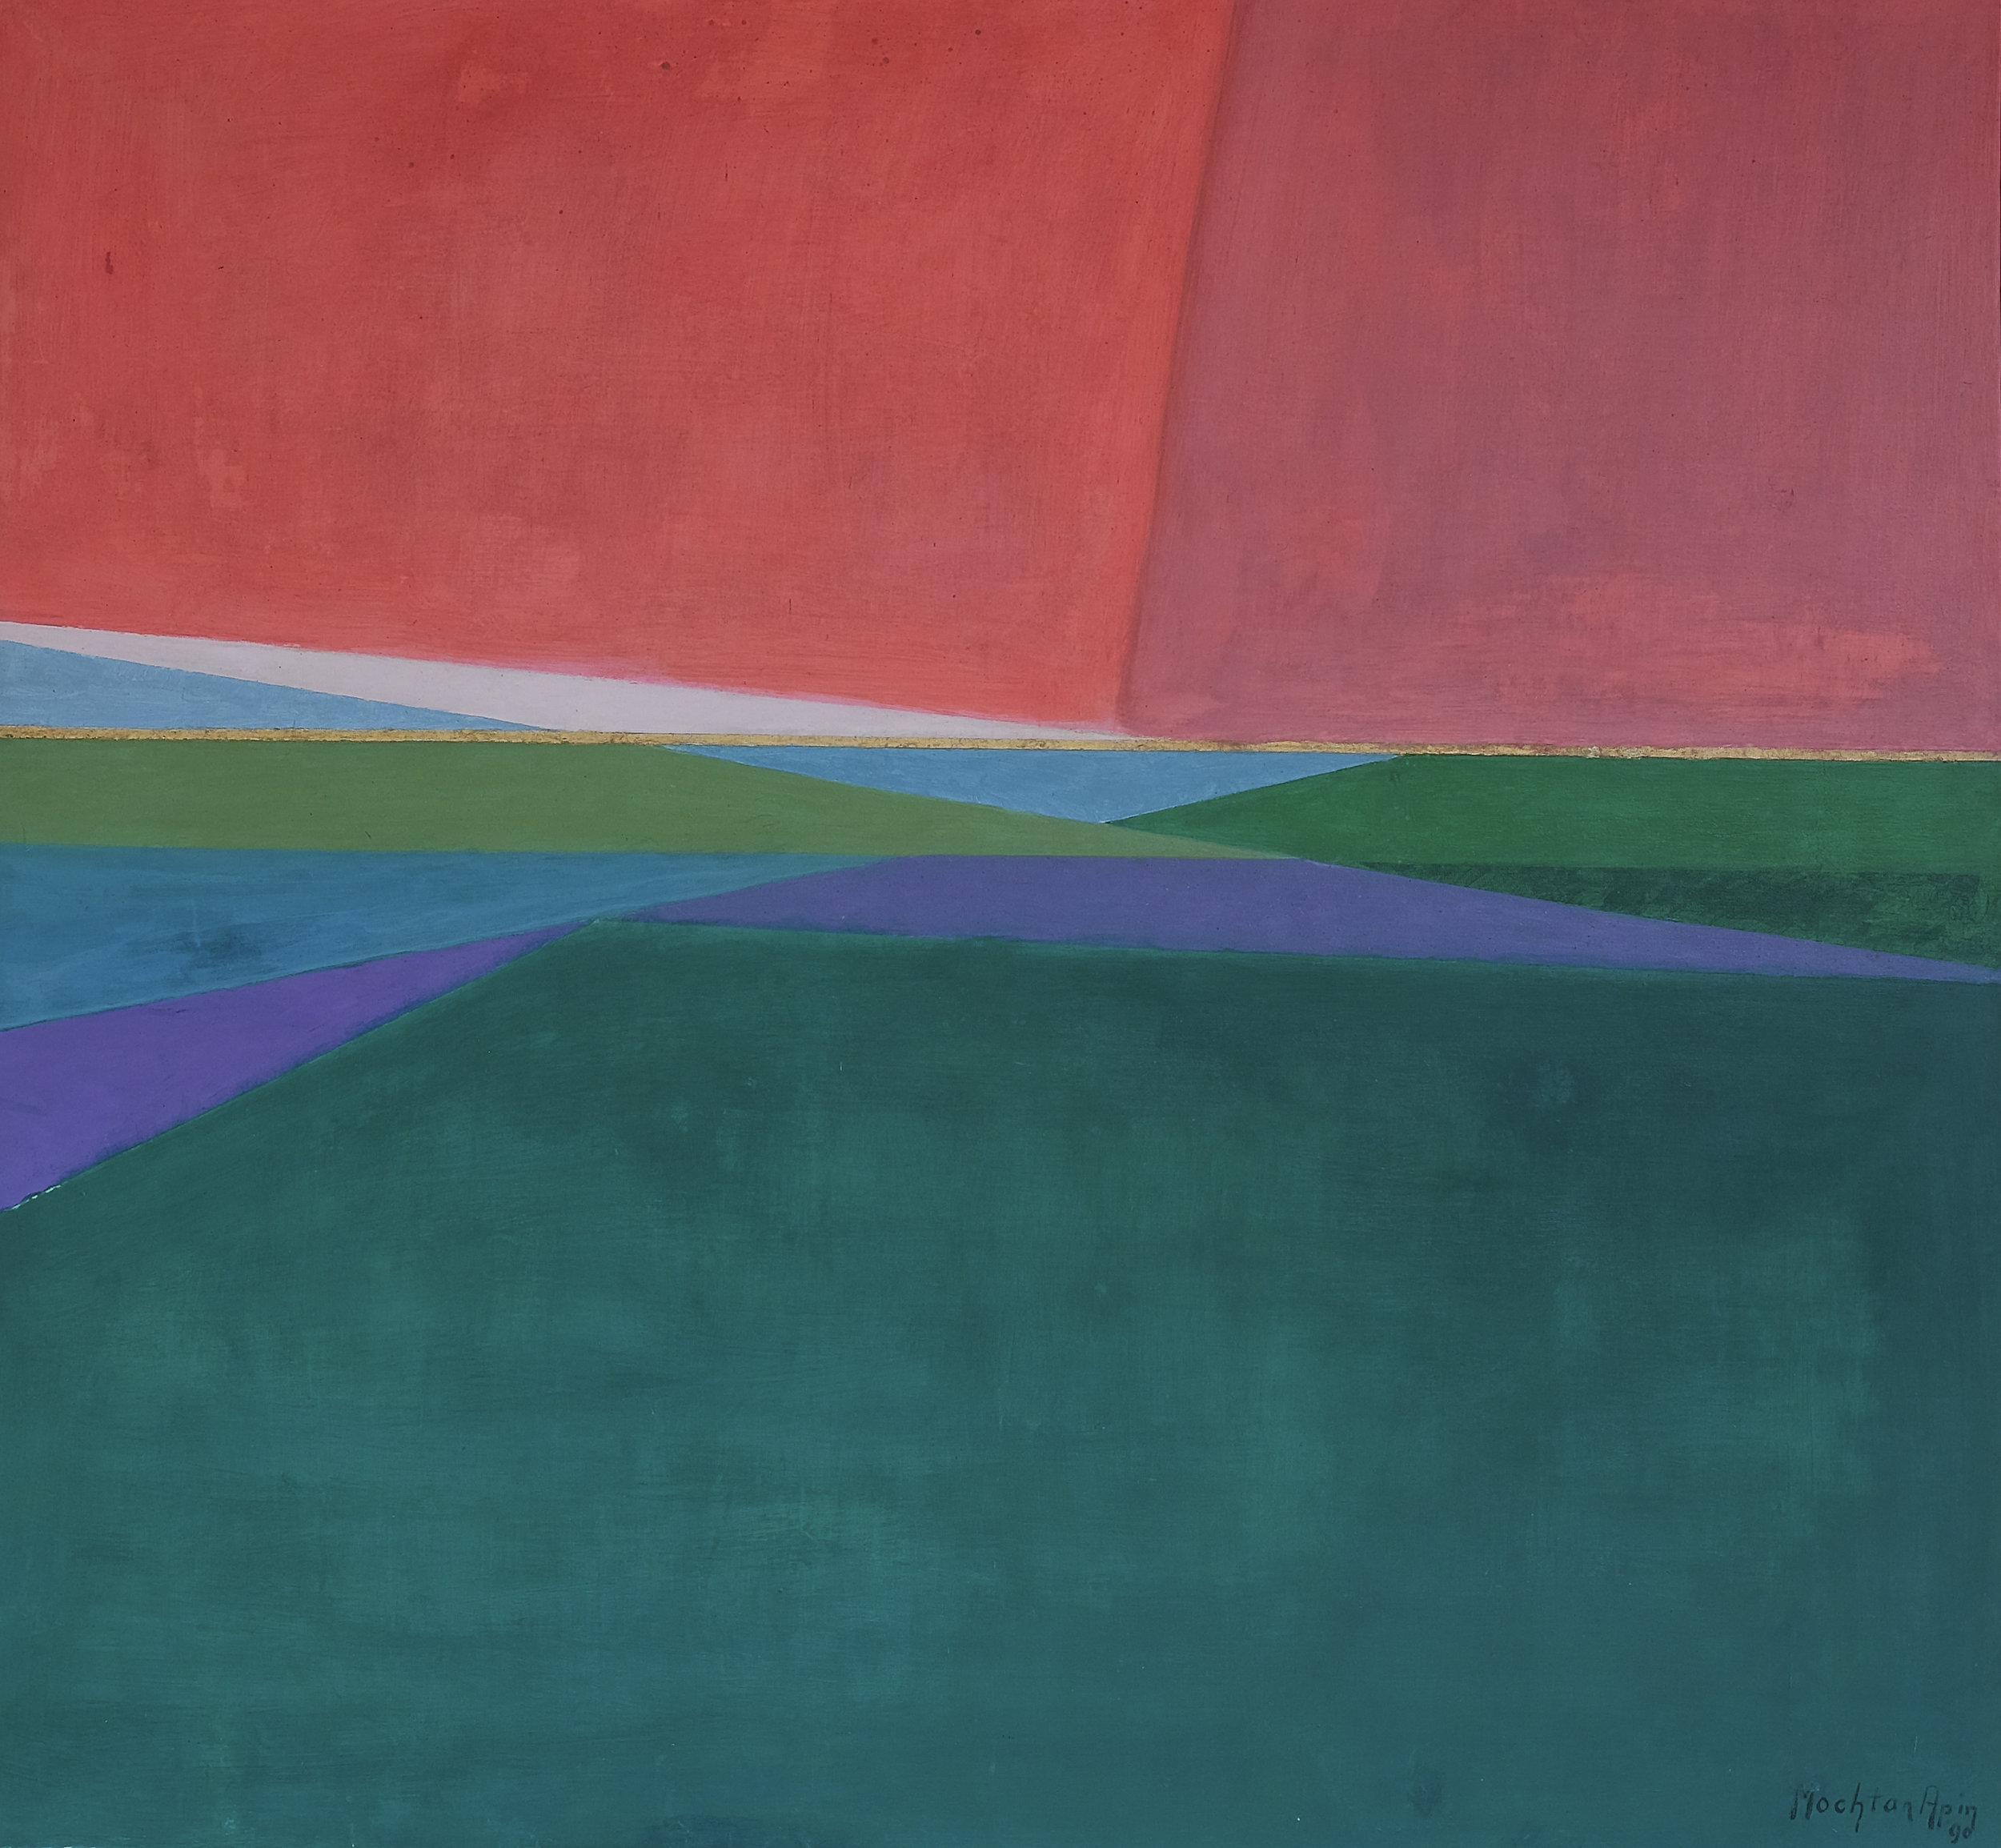 Mochtar Apin, Pemandangan (Landscape), acrylic on canvas, 130 x 140 cm, 1990